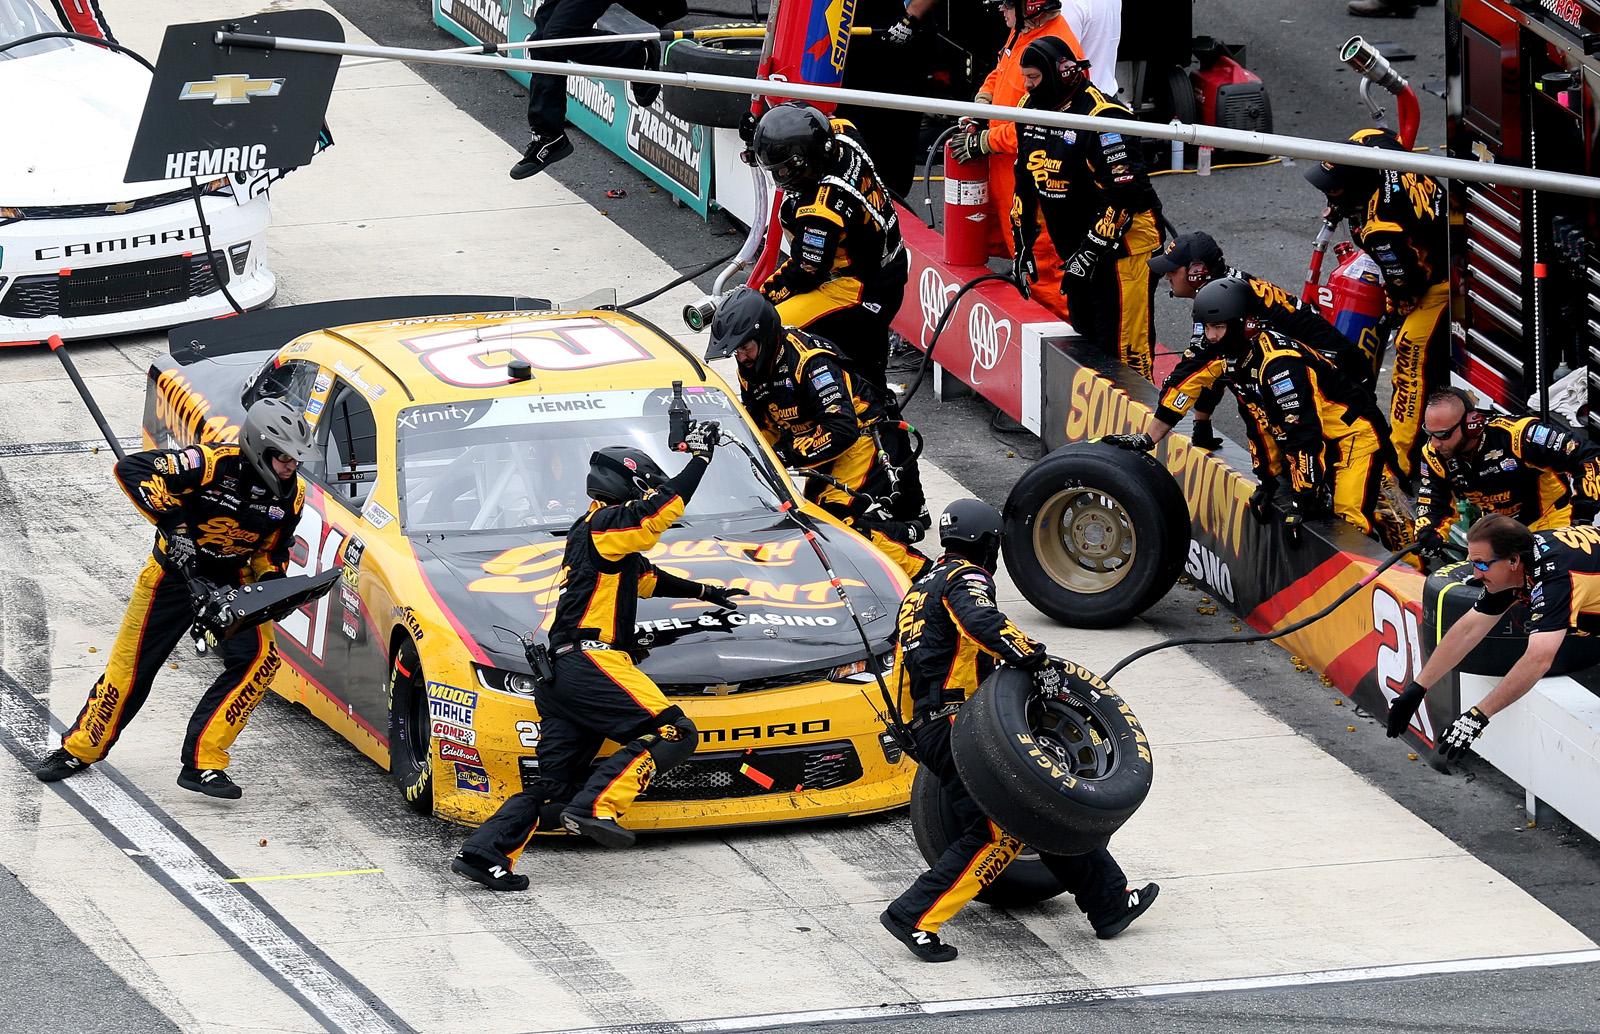 NASCAR Xfinity Series OneMain Financial 200